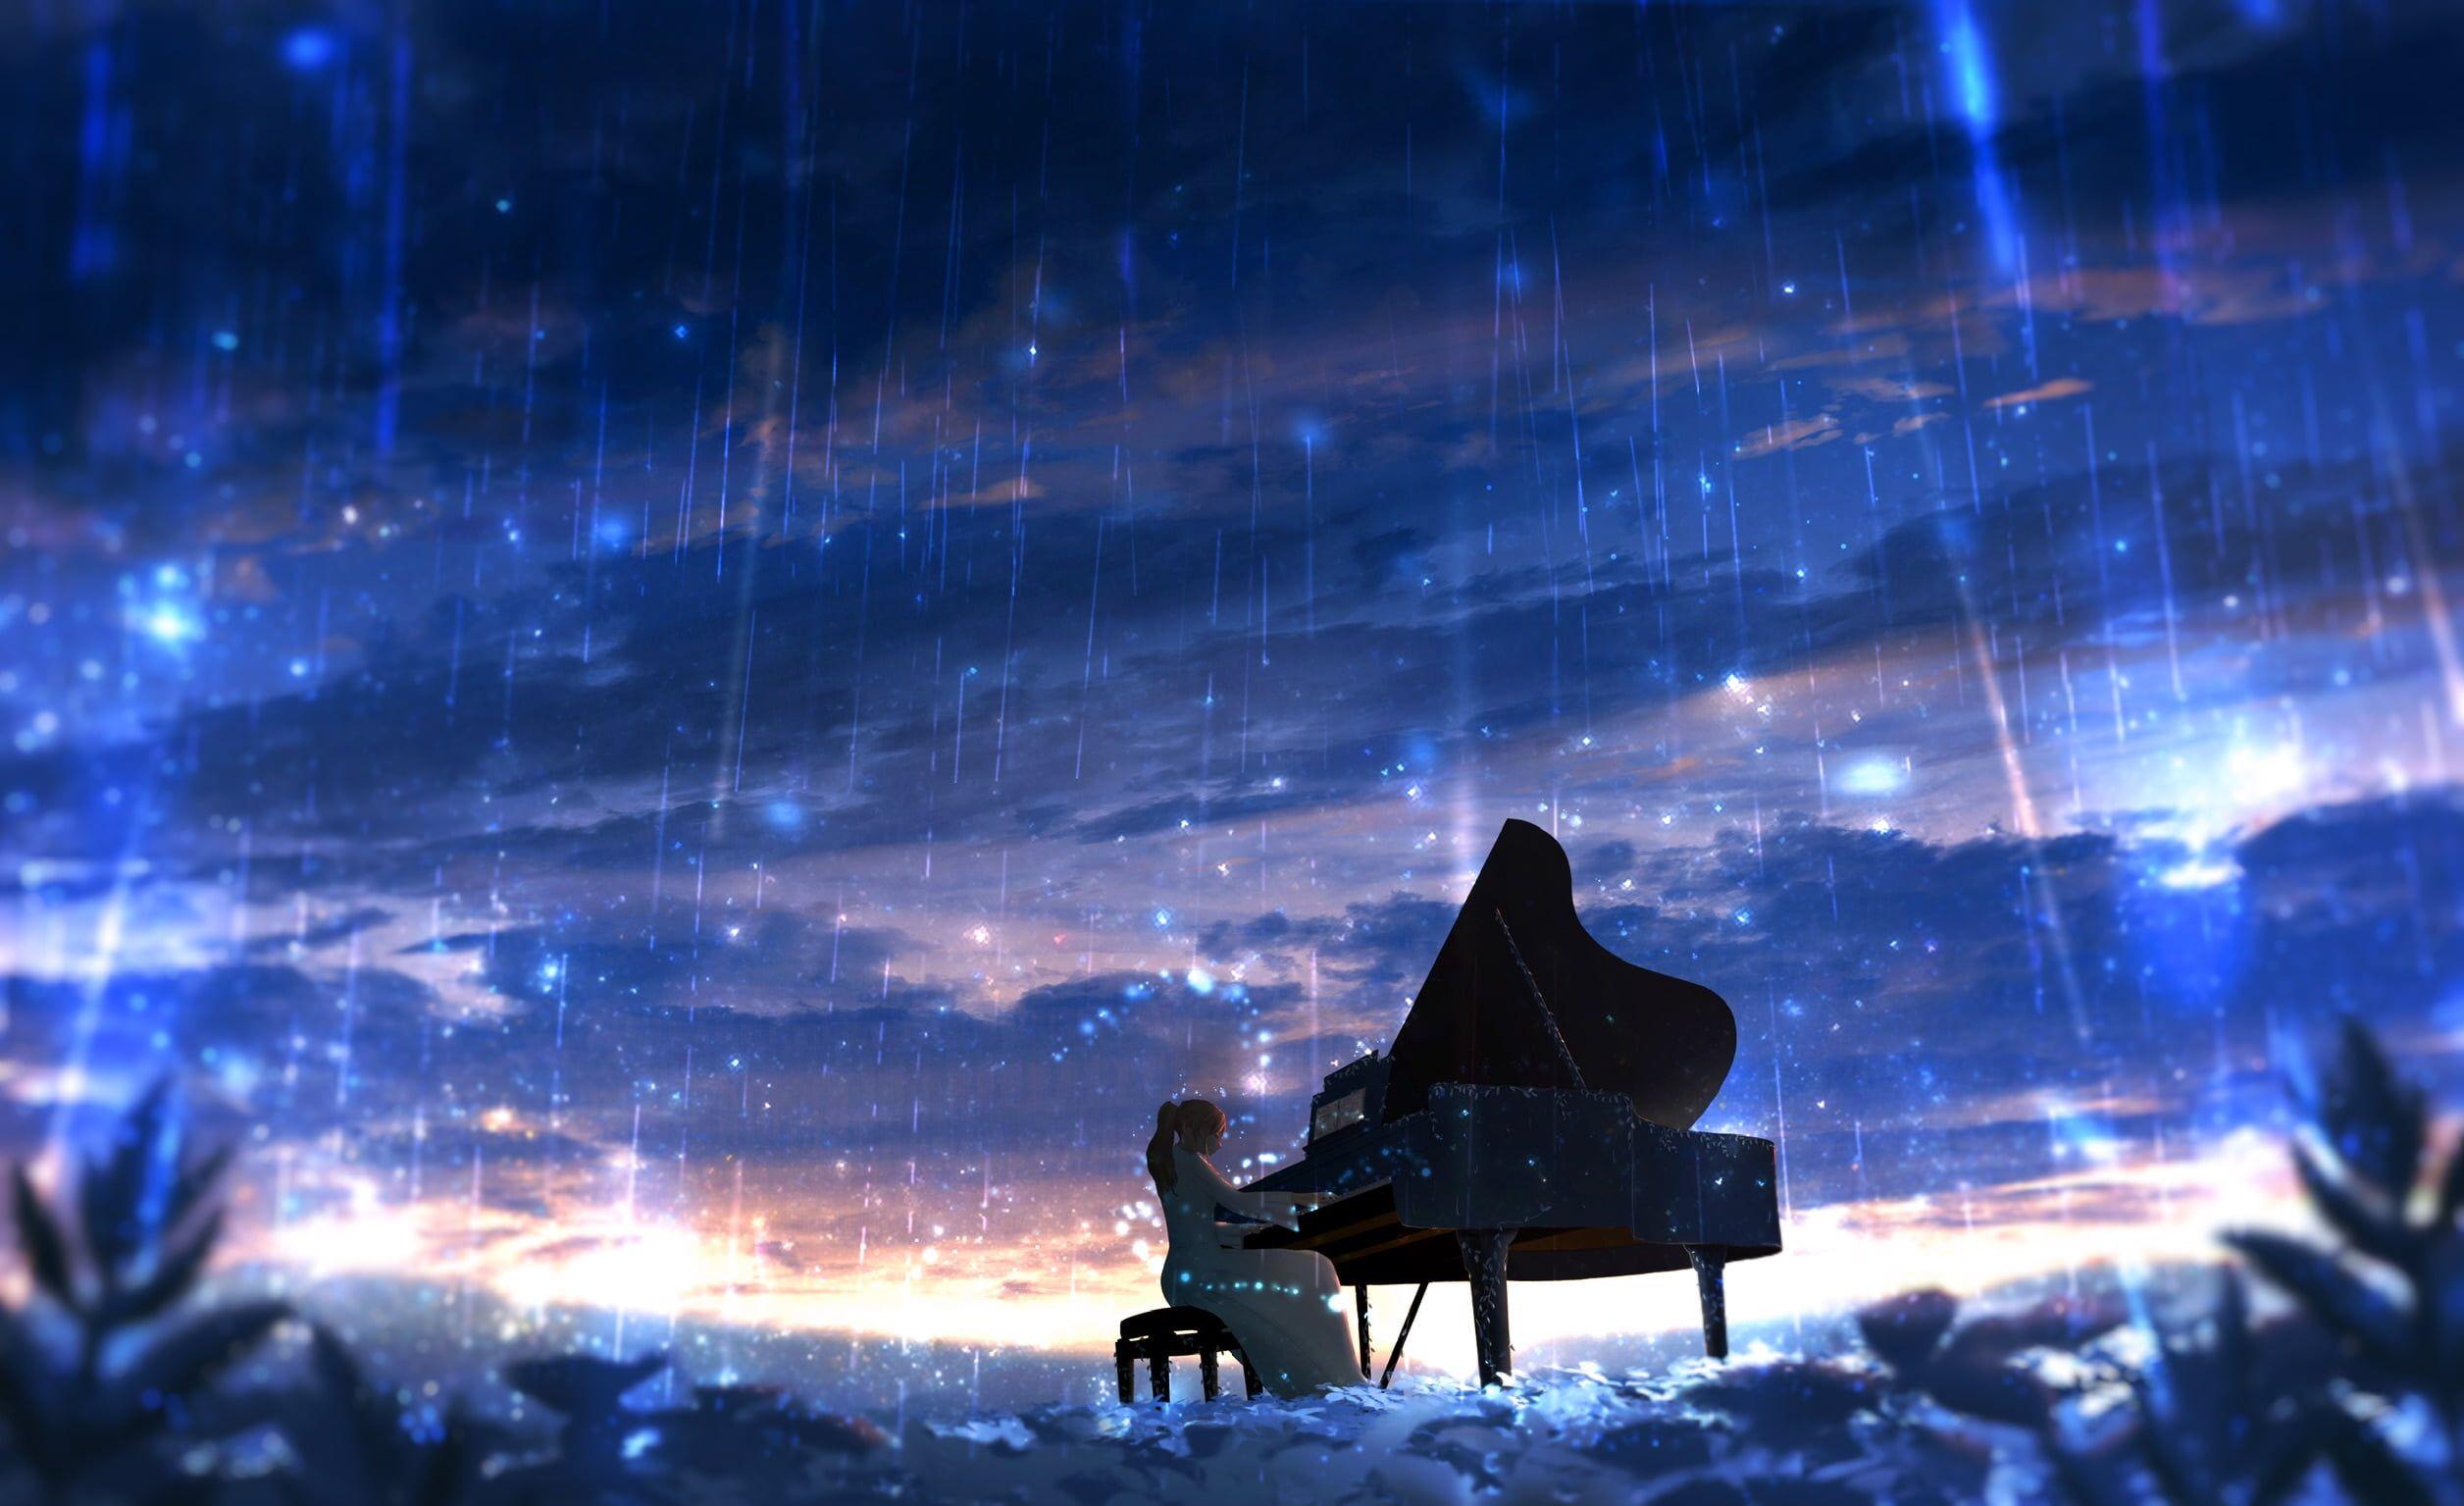 Anime Original Girl Piano Rain 1080p Wallpaper Hdwallpaper Desktop Anime Scenery Anime Wallpaper Anime Background